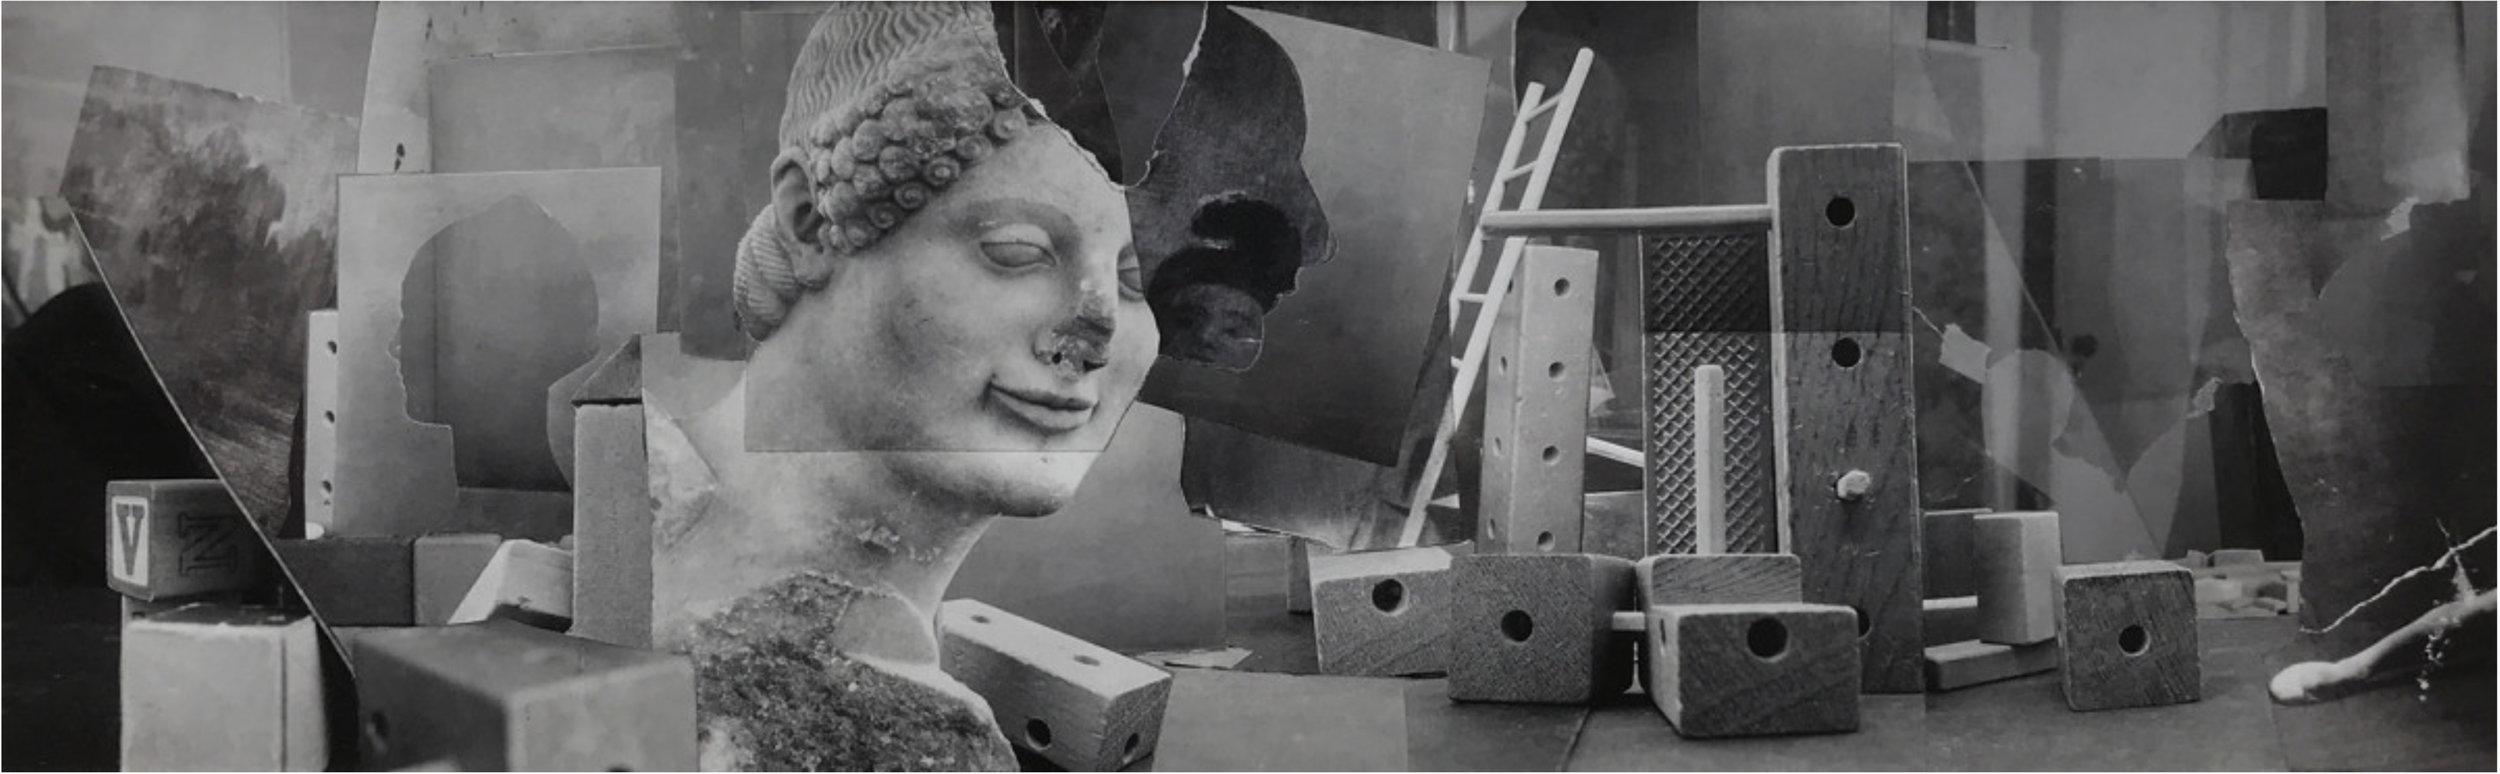 John O'Reilly  Ladder , 2005  polaroid montage  5.13h x 16.13w in